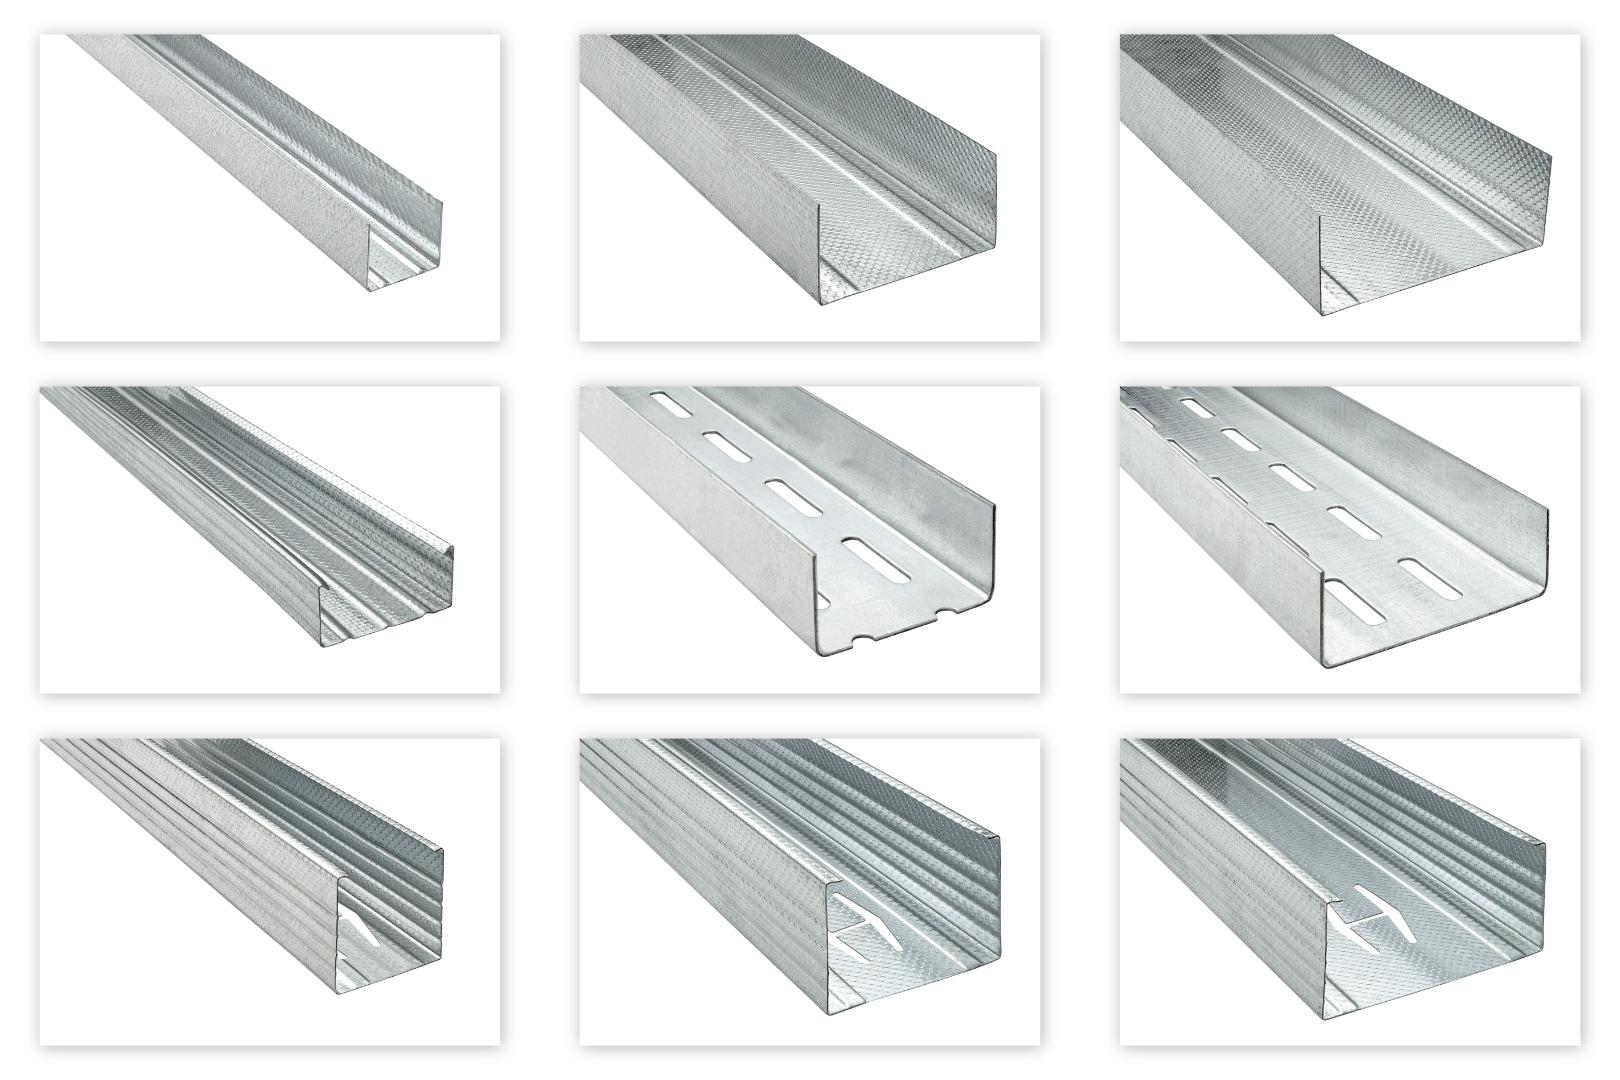 CD UD CW UW UA Trockenbau Profile 2-4m Deckenabhängung Ständerwerk Selbstabholung